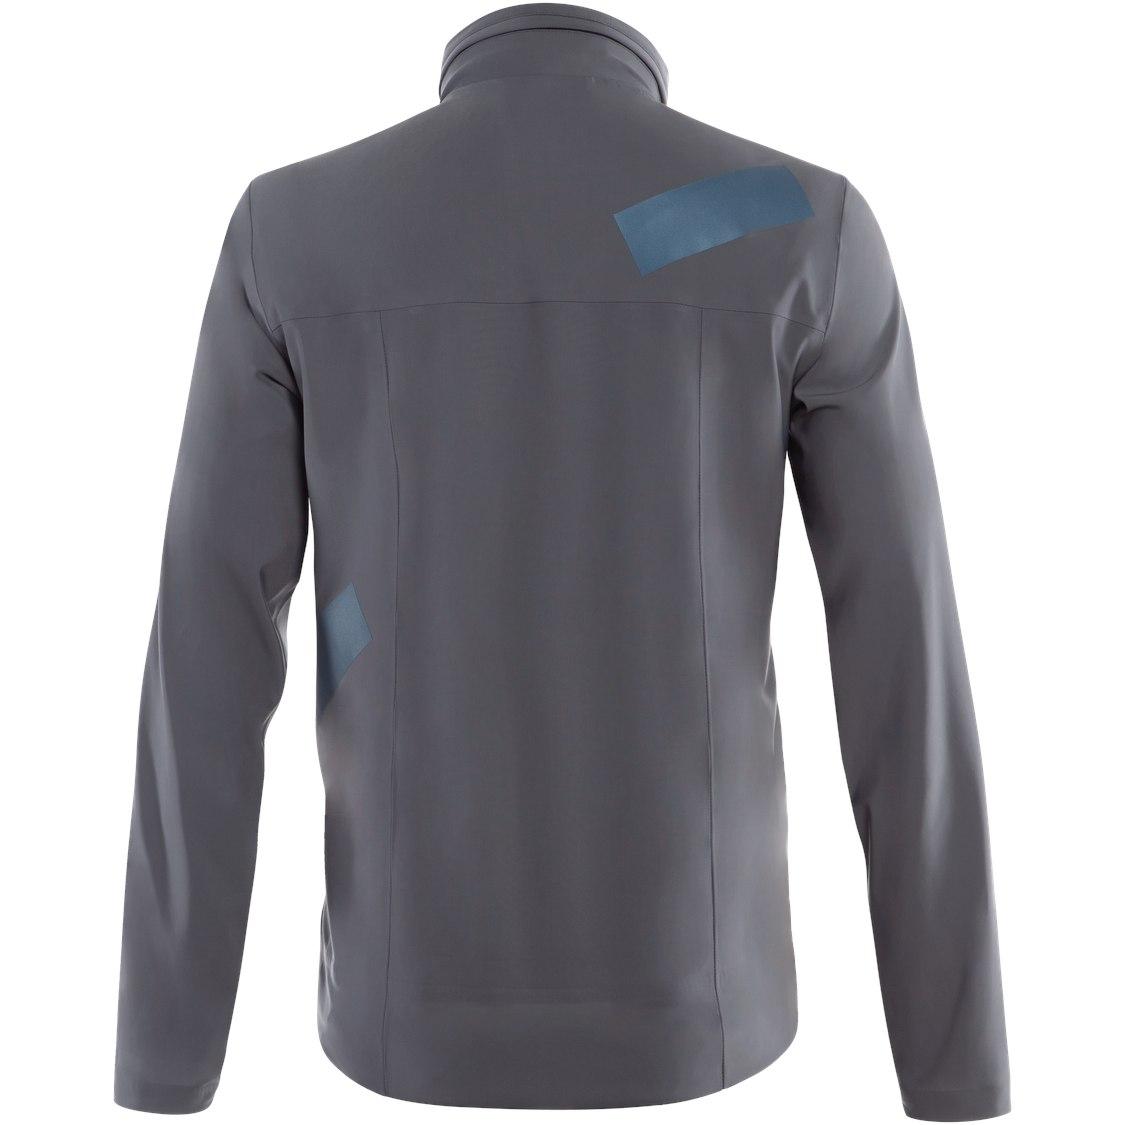 Image of Dainese AWA Black 3L Rain Jacket - ombre blue